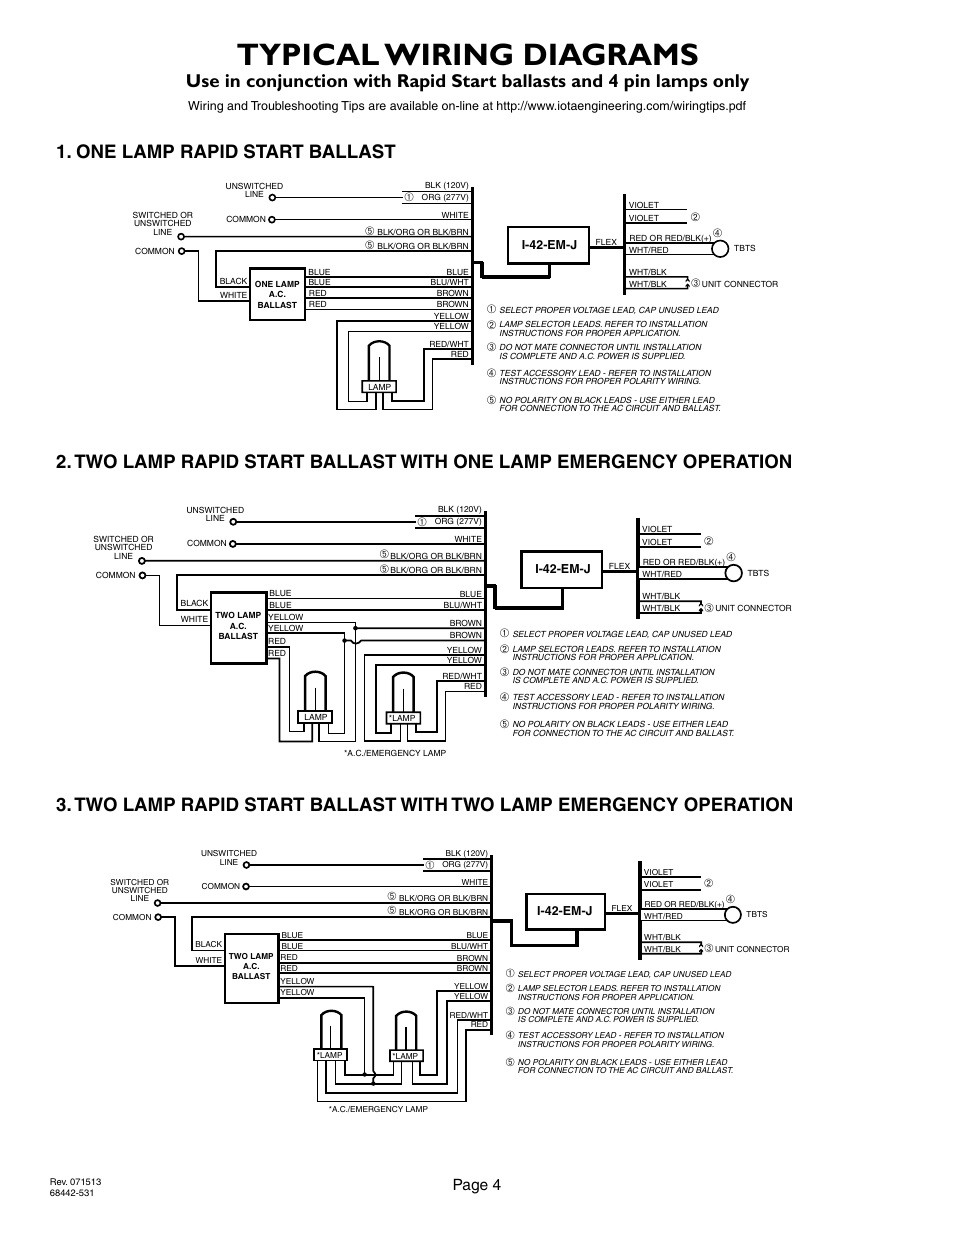 iota i 42 em j page4?resize\=665%2C861 iota i320 emergency ballast wiring diagram 277 lighting wiring  at reclaimingppi.co